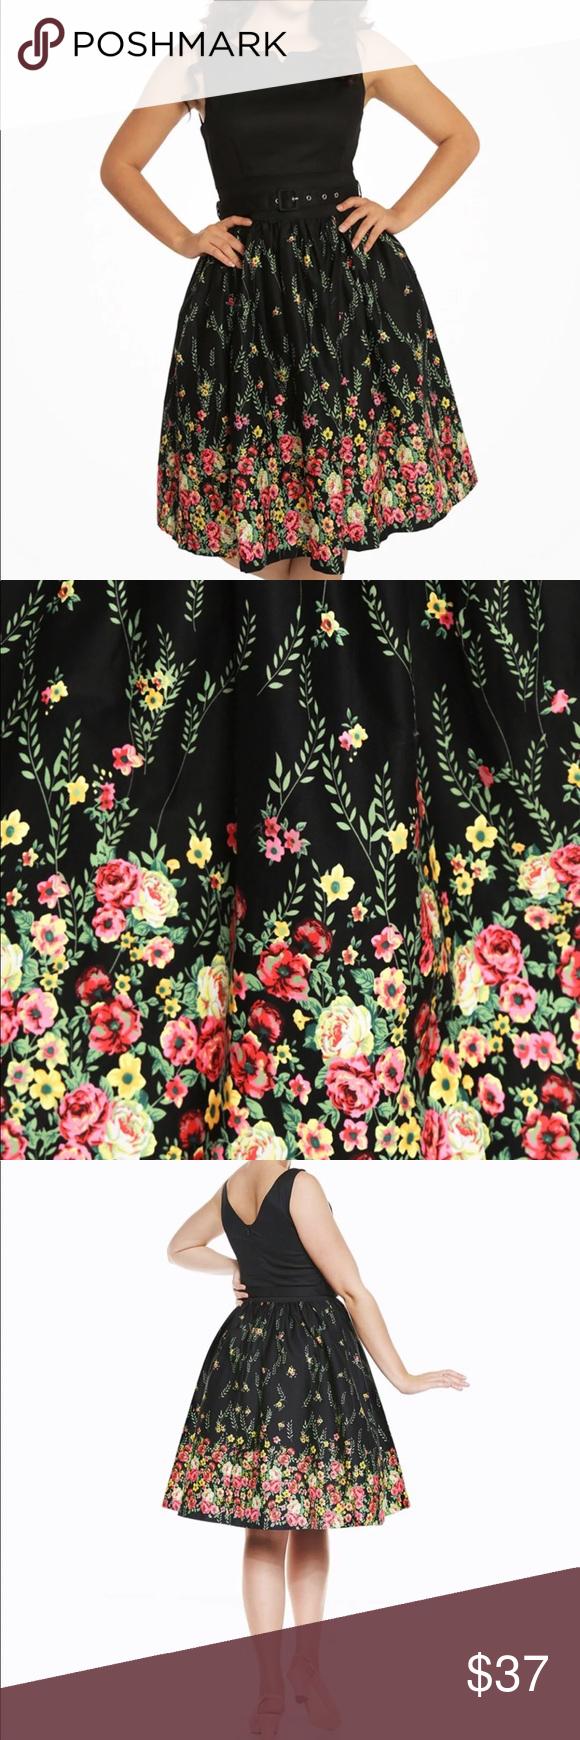 Lindy Bop Delta Fl Swing Dress Uk12 New From Size Chart Waist 30 3 Bust 36 6 Length 41 7 Dresses